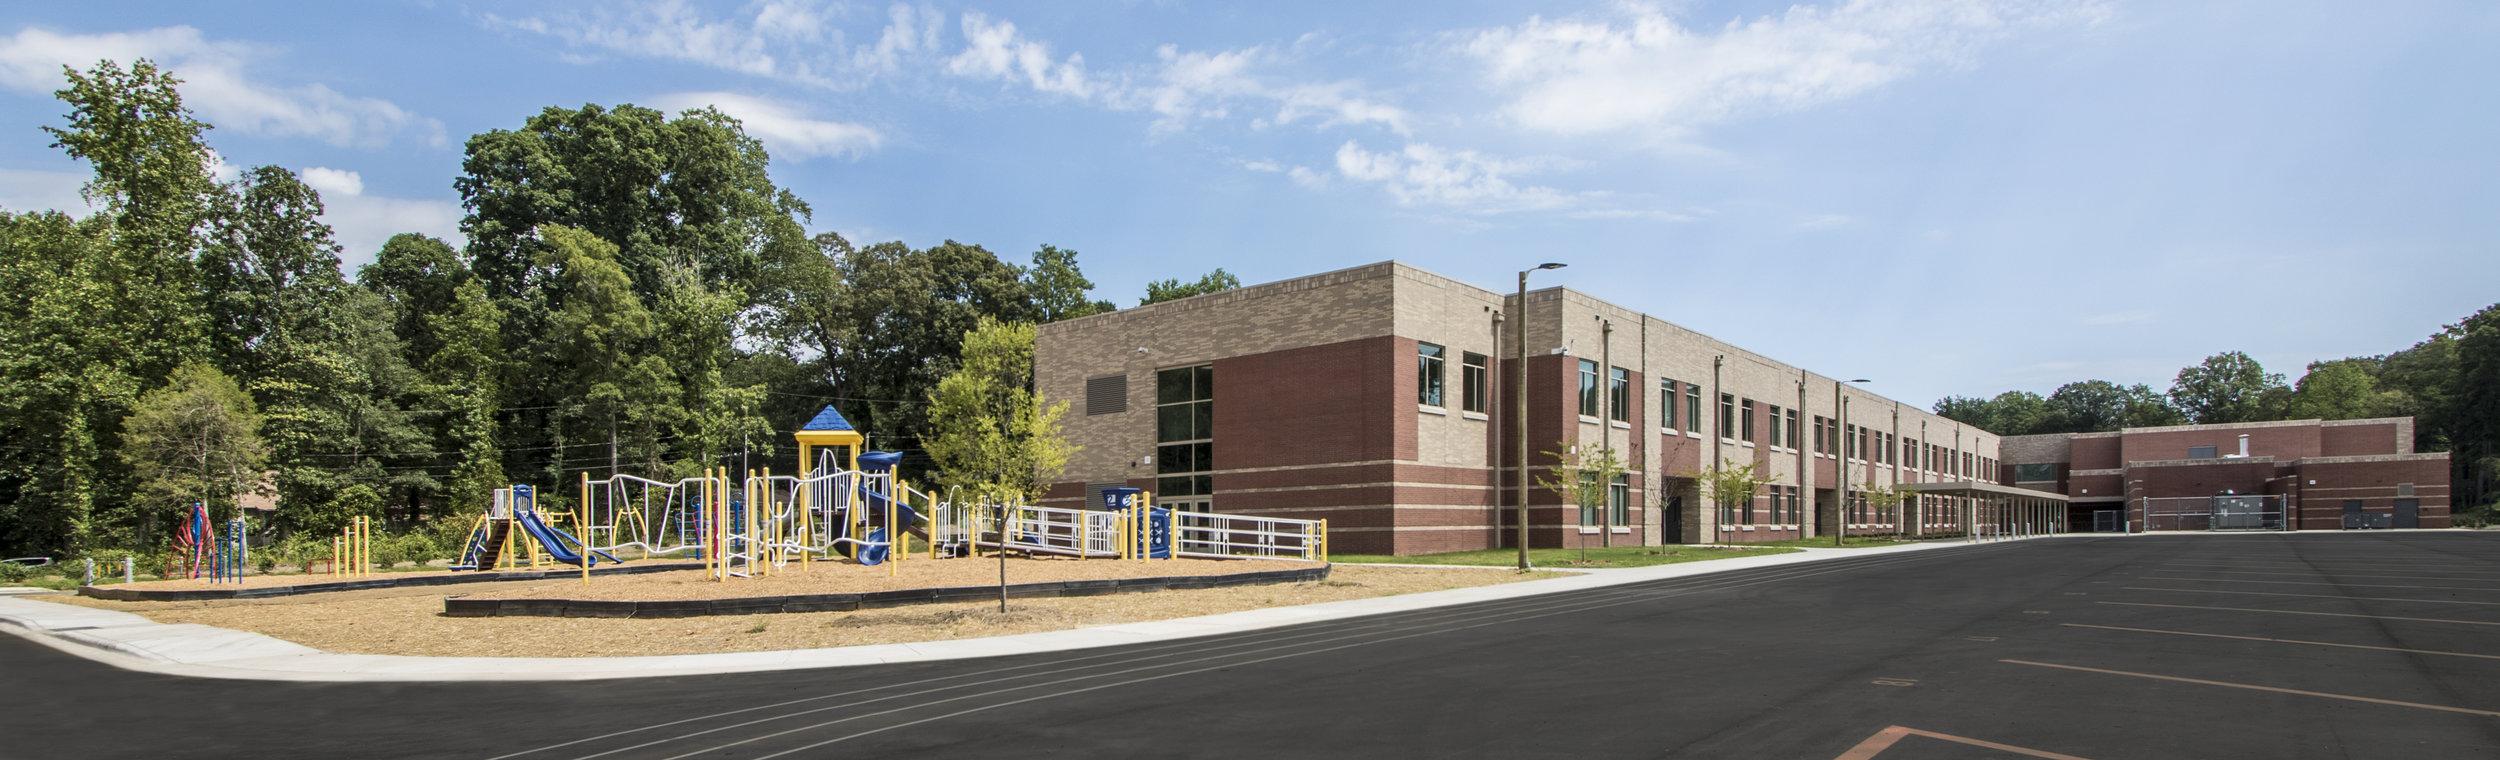 ADW-K-12-Education-Statesville-Road-Elementary-School-Charlotte-NC-Playground.JPG